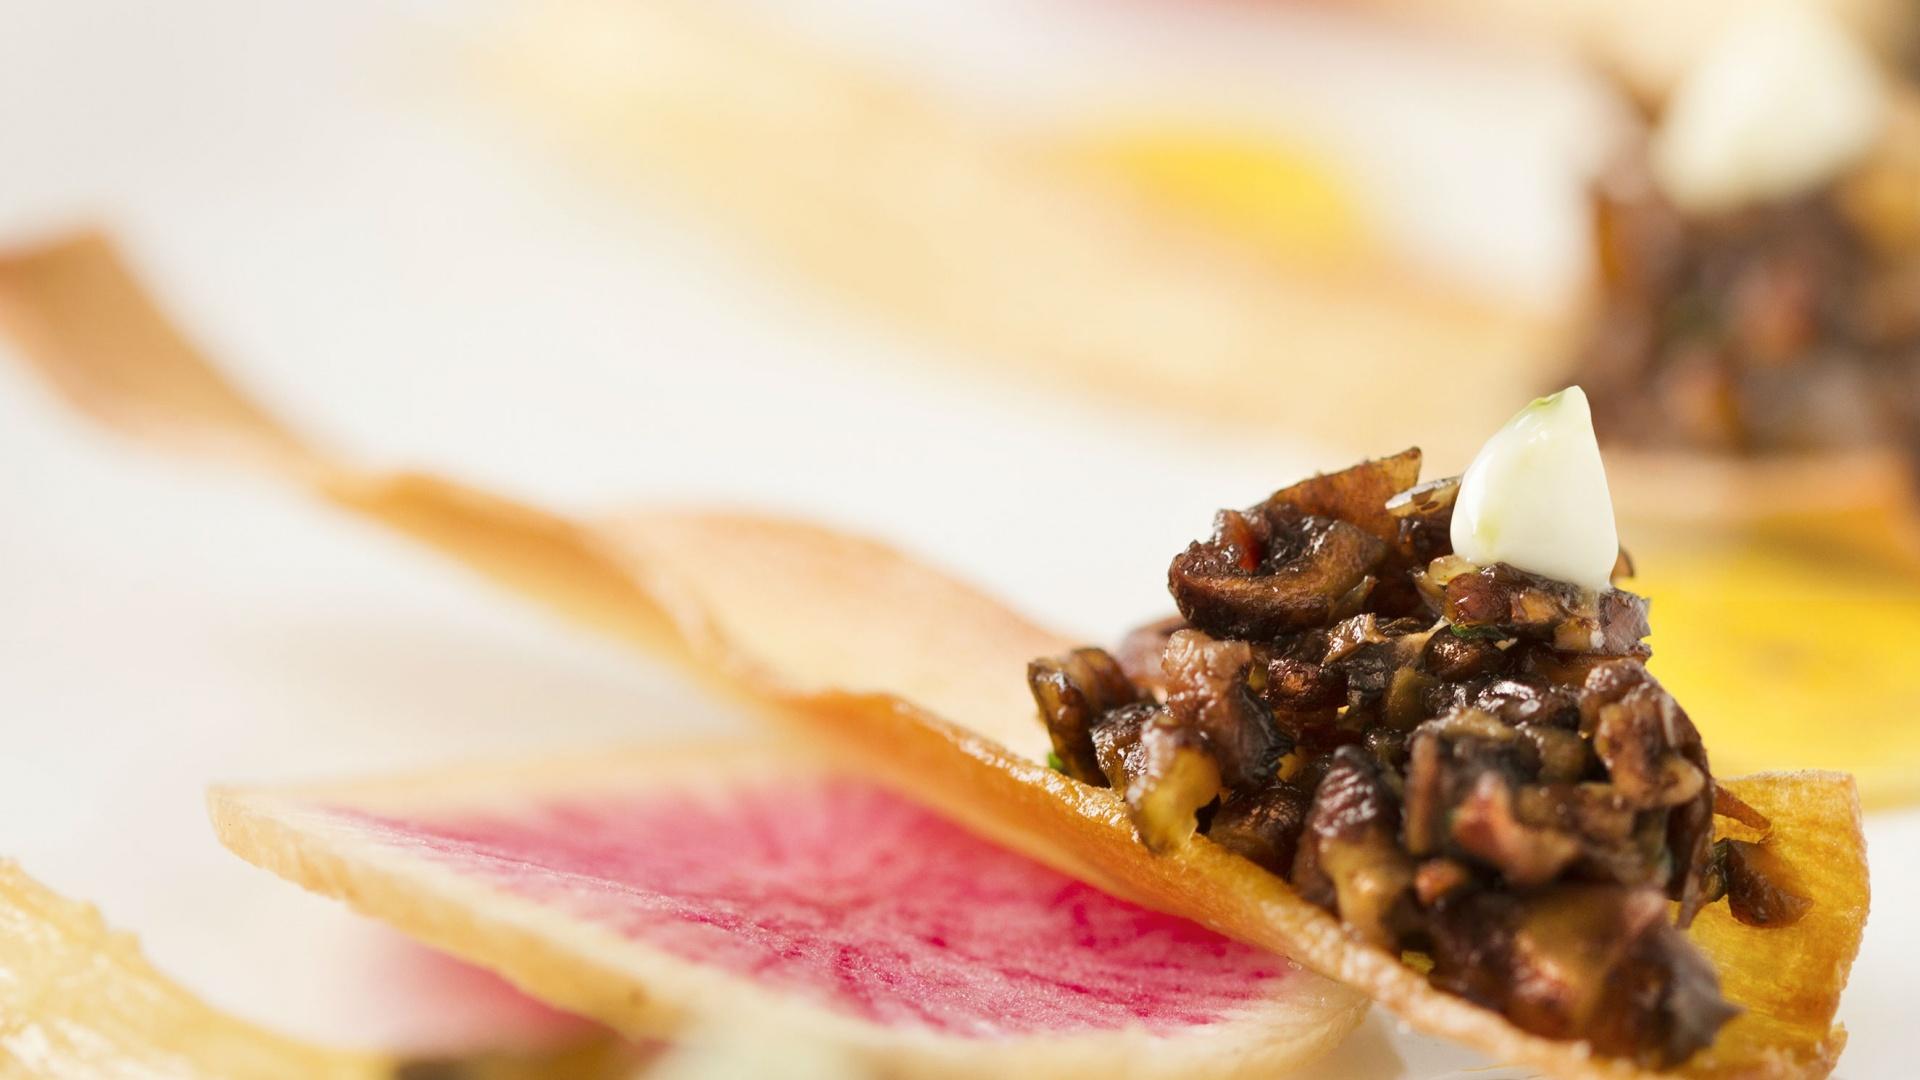 Make This: Treeline Catering's Mushroom Duxelle with Malt Aioli